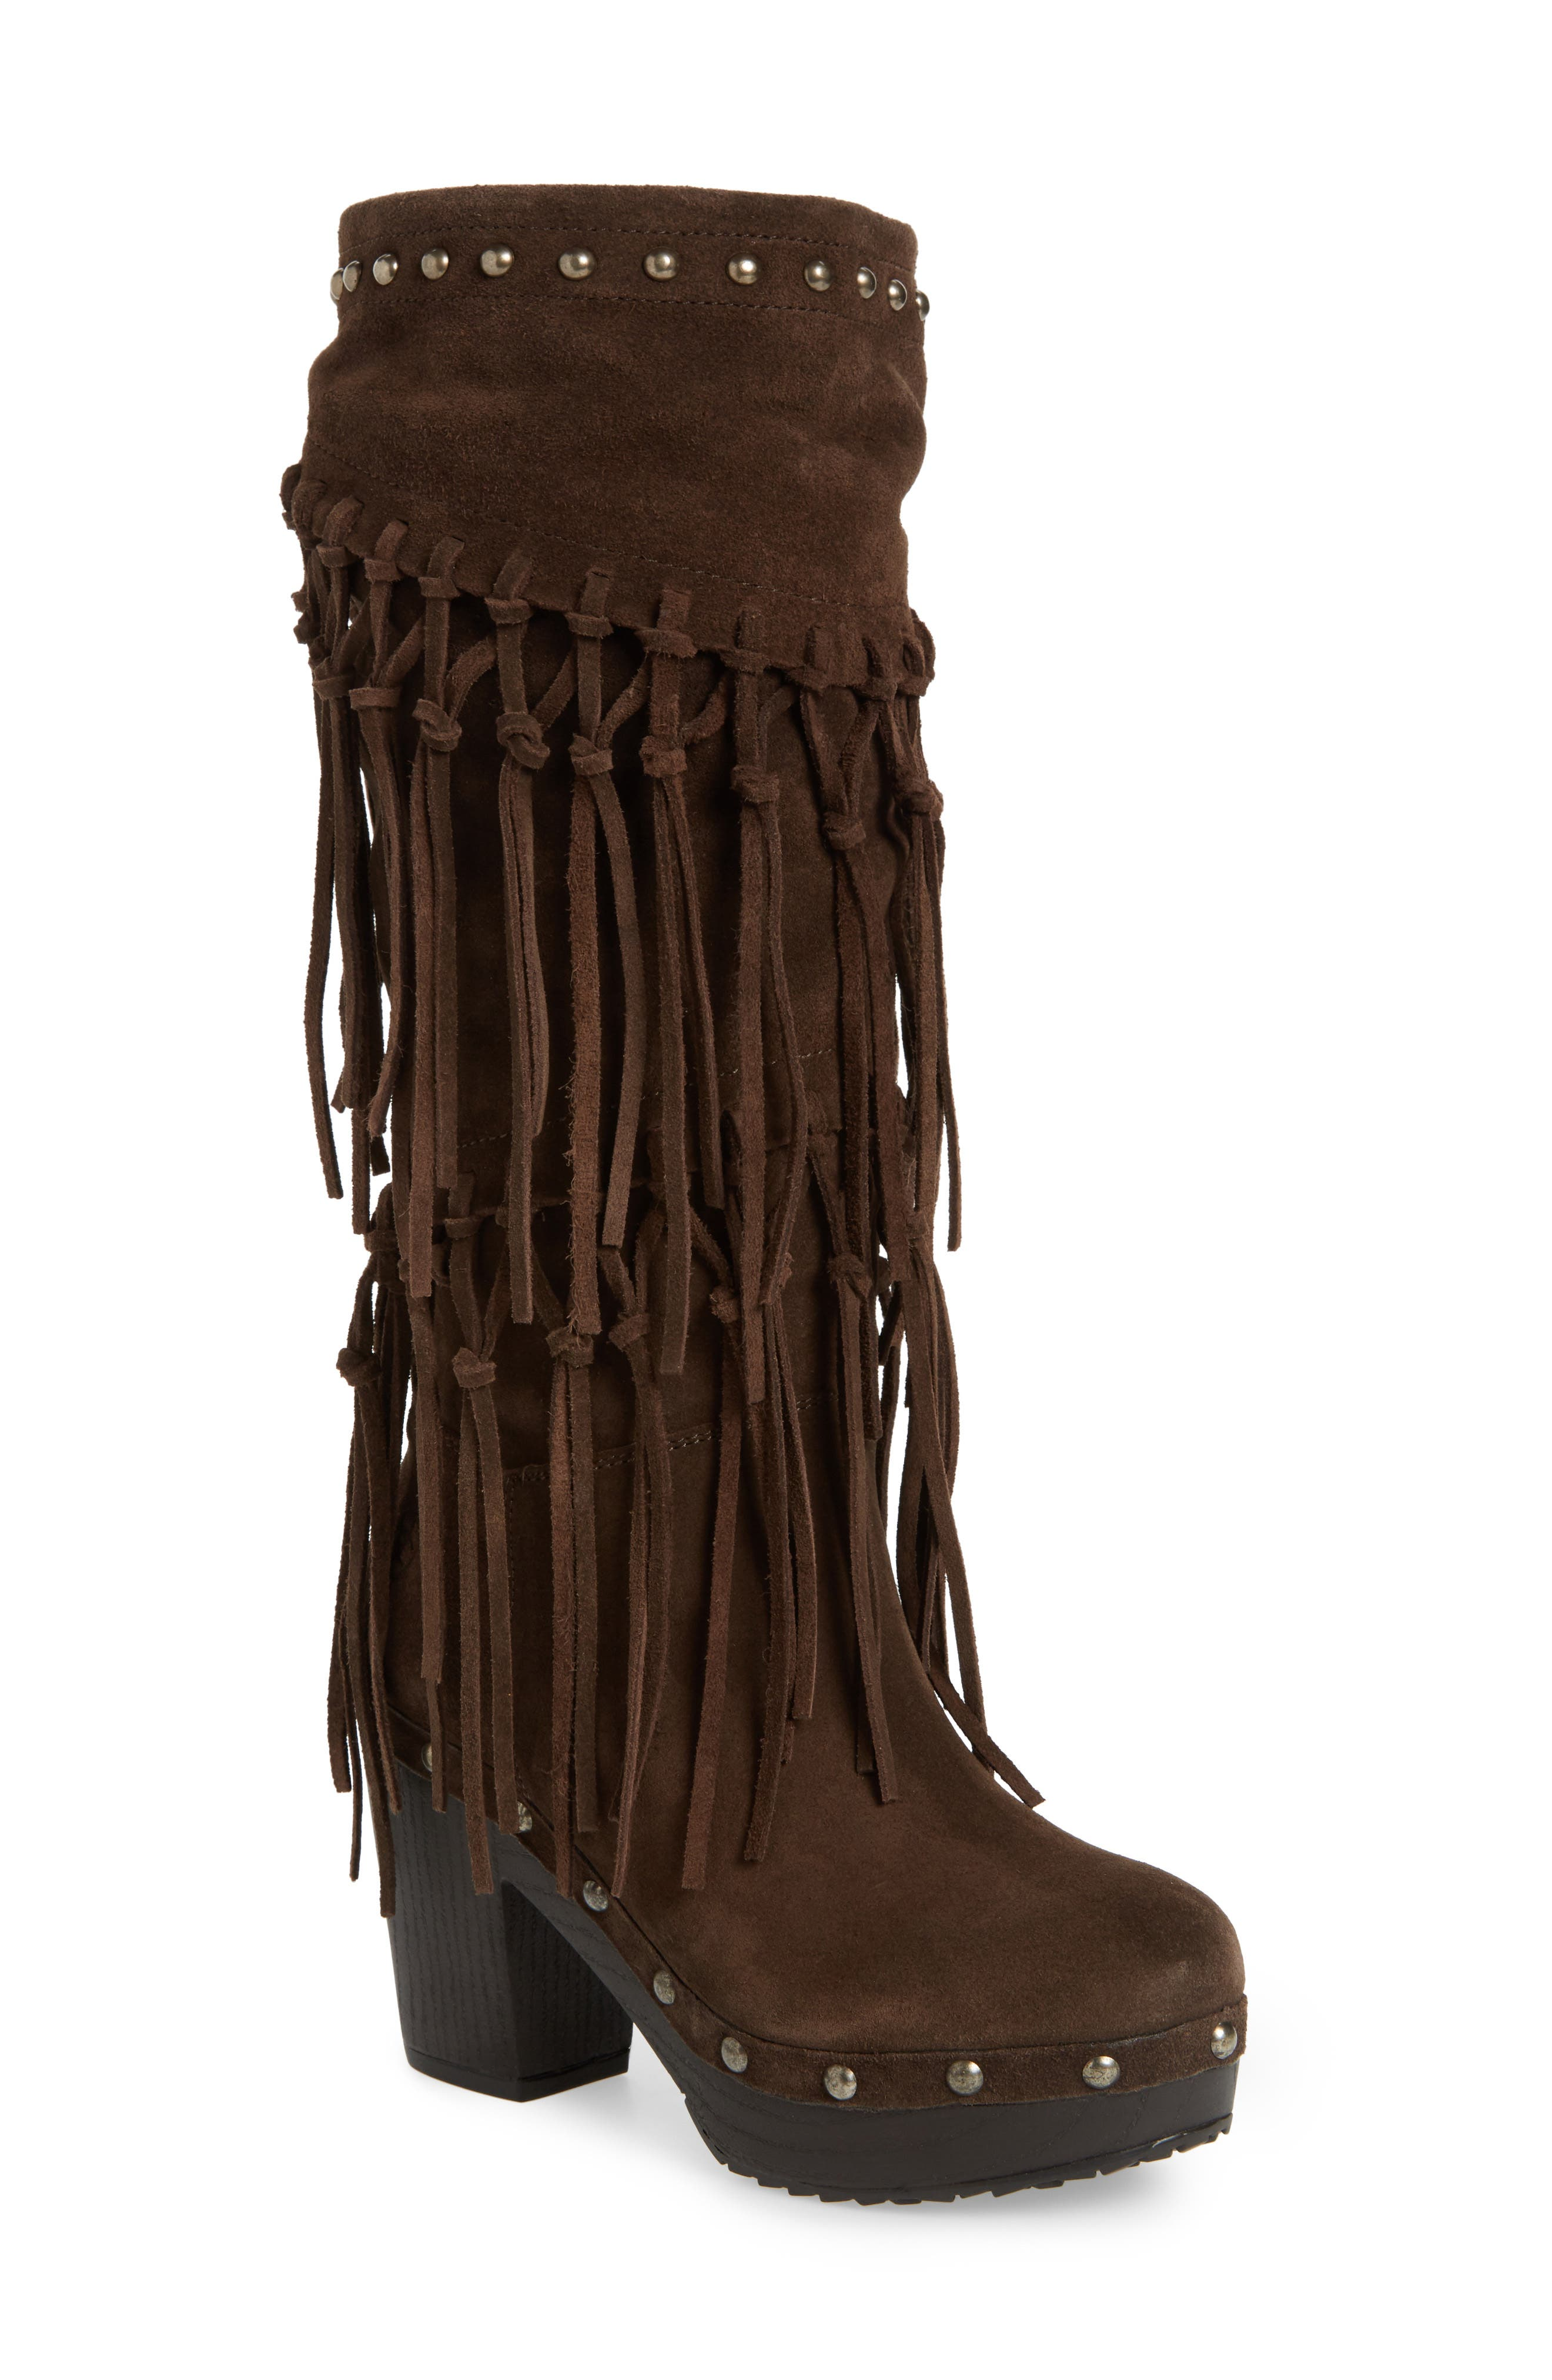 Alternate Image 1 Selected - Ariat Music Row Fringe Boot (Women)